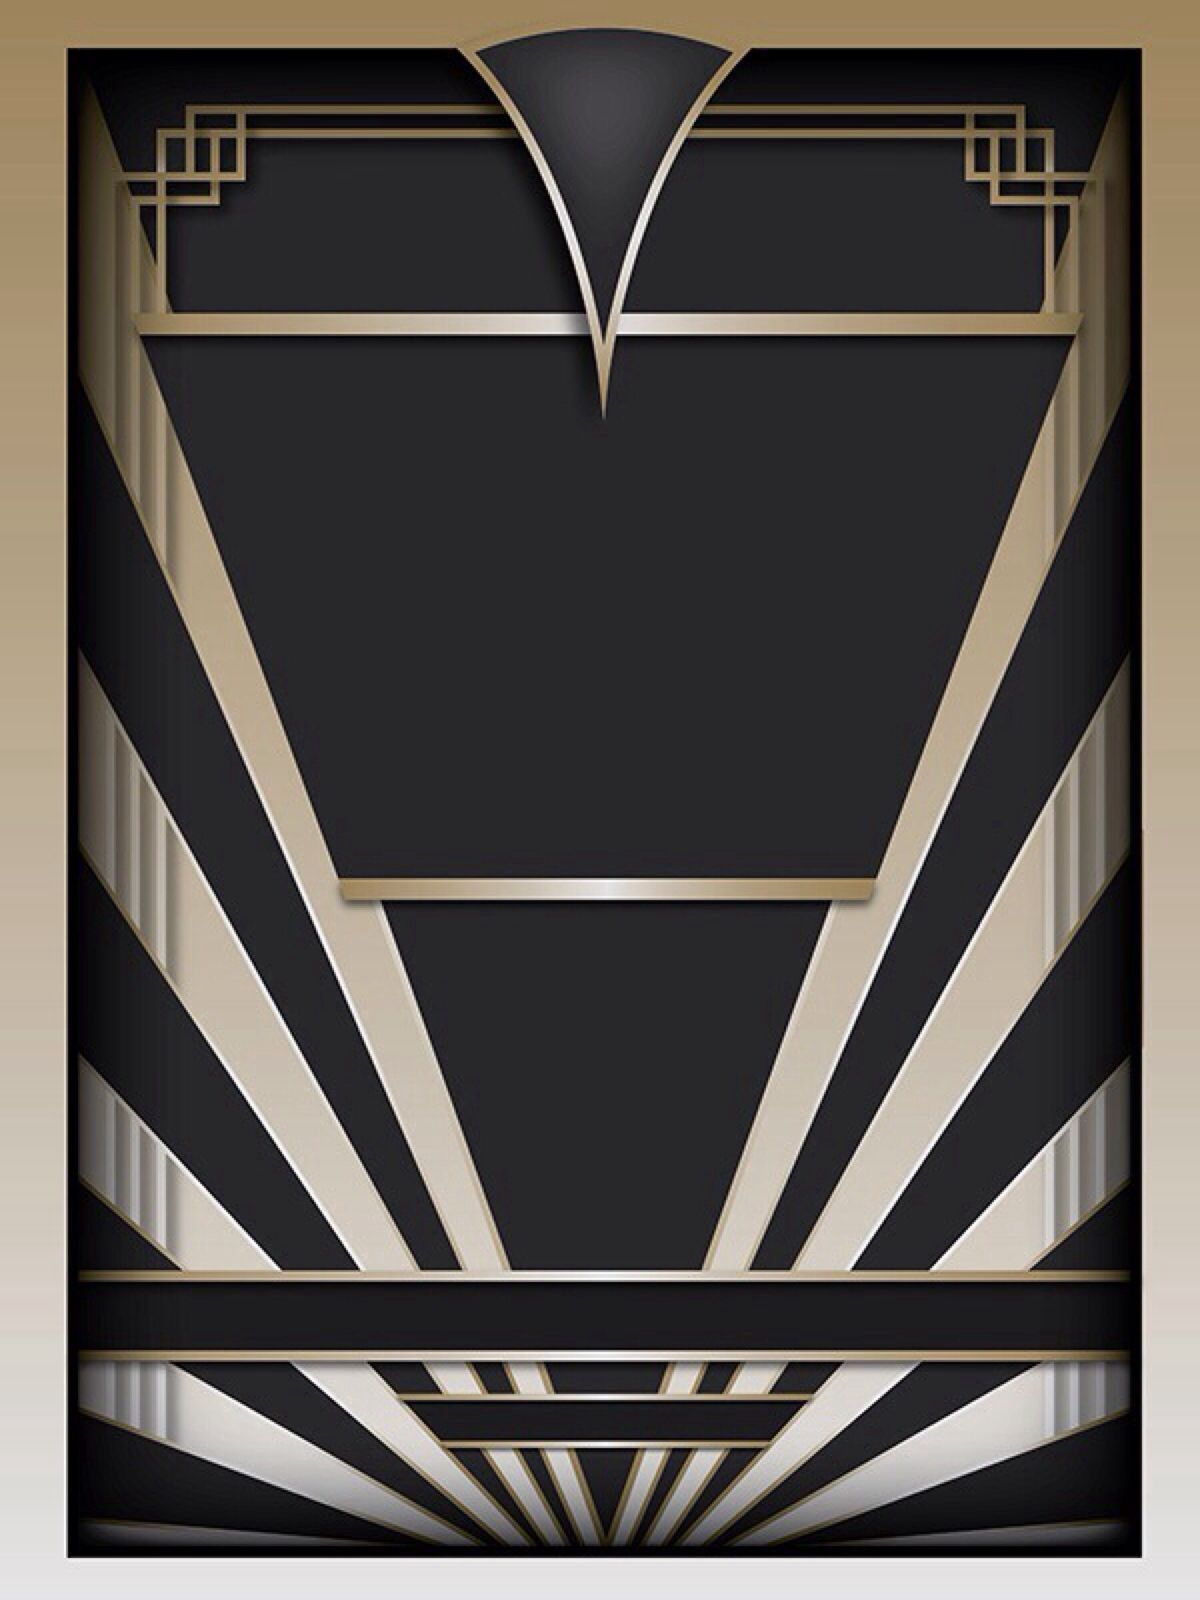 Art Deco Style Living Room: Art Deco Design-public Domain